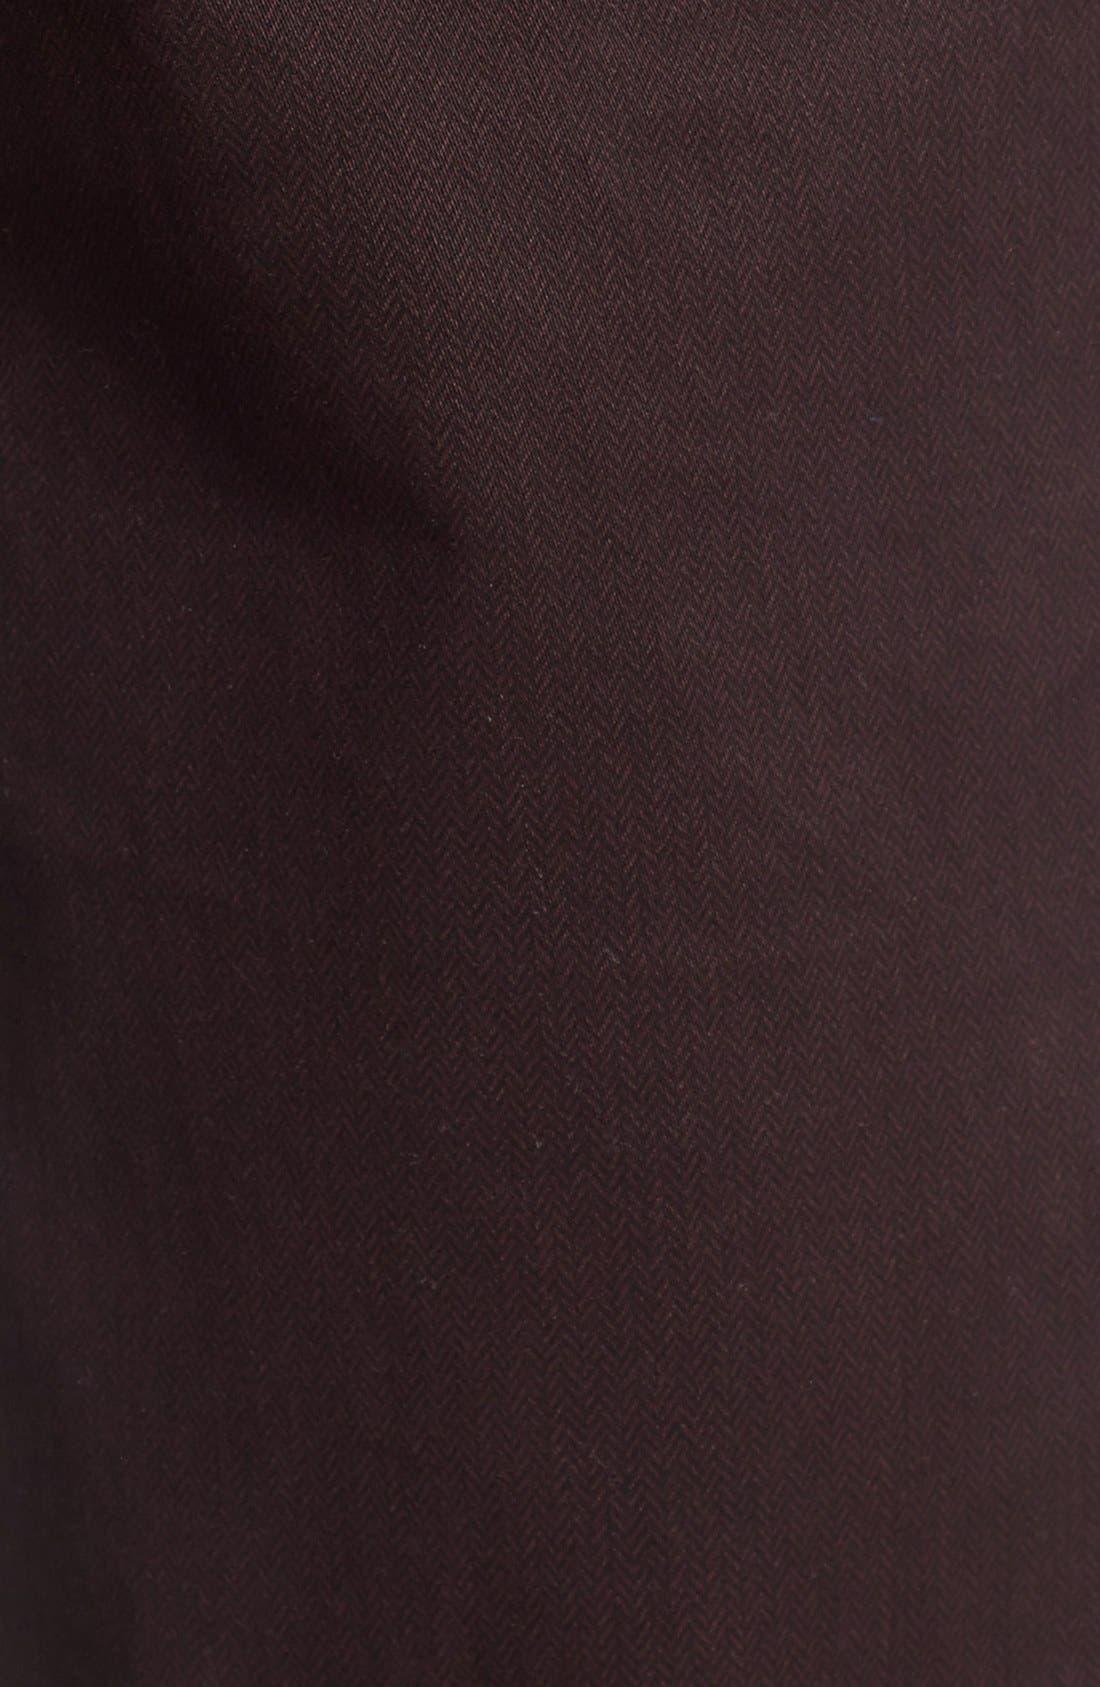 Print Slim Fit Trouser Jeans,                             Alternate thumbnail 5, color,                             601